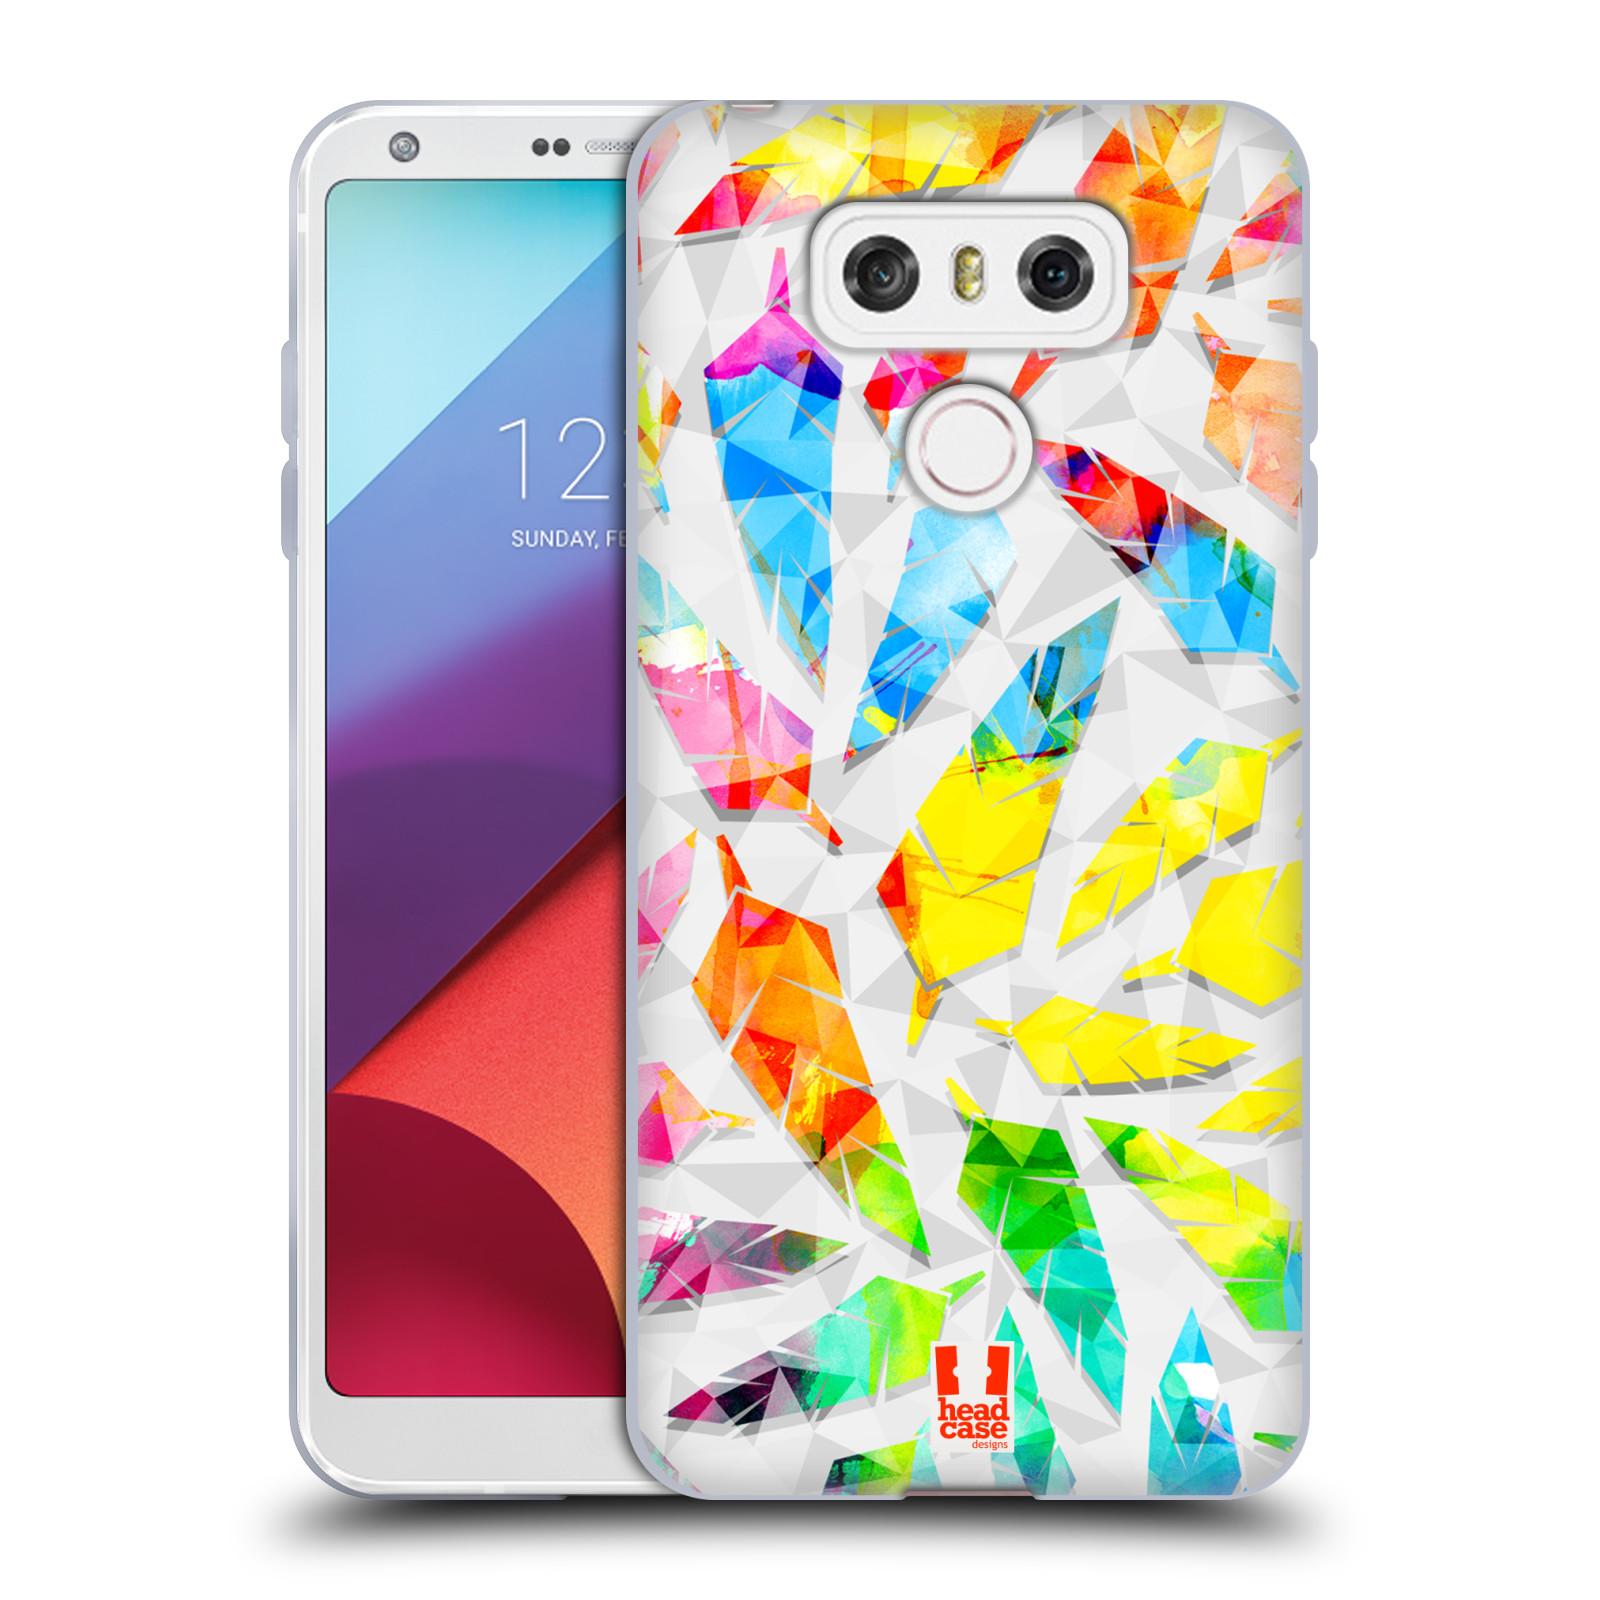 Silikonové pouzdro na mobil LG G6 - Head Case PÍRKA WATERCOLOUR (Silikonový kryt či obal na mobilní telefon LG G6 H870 / LG G6 Dual SIM H870DS)